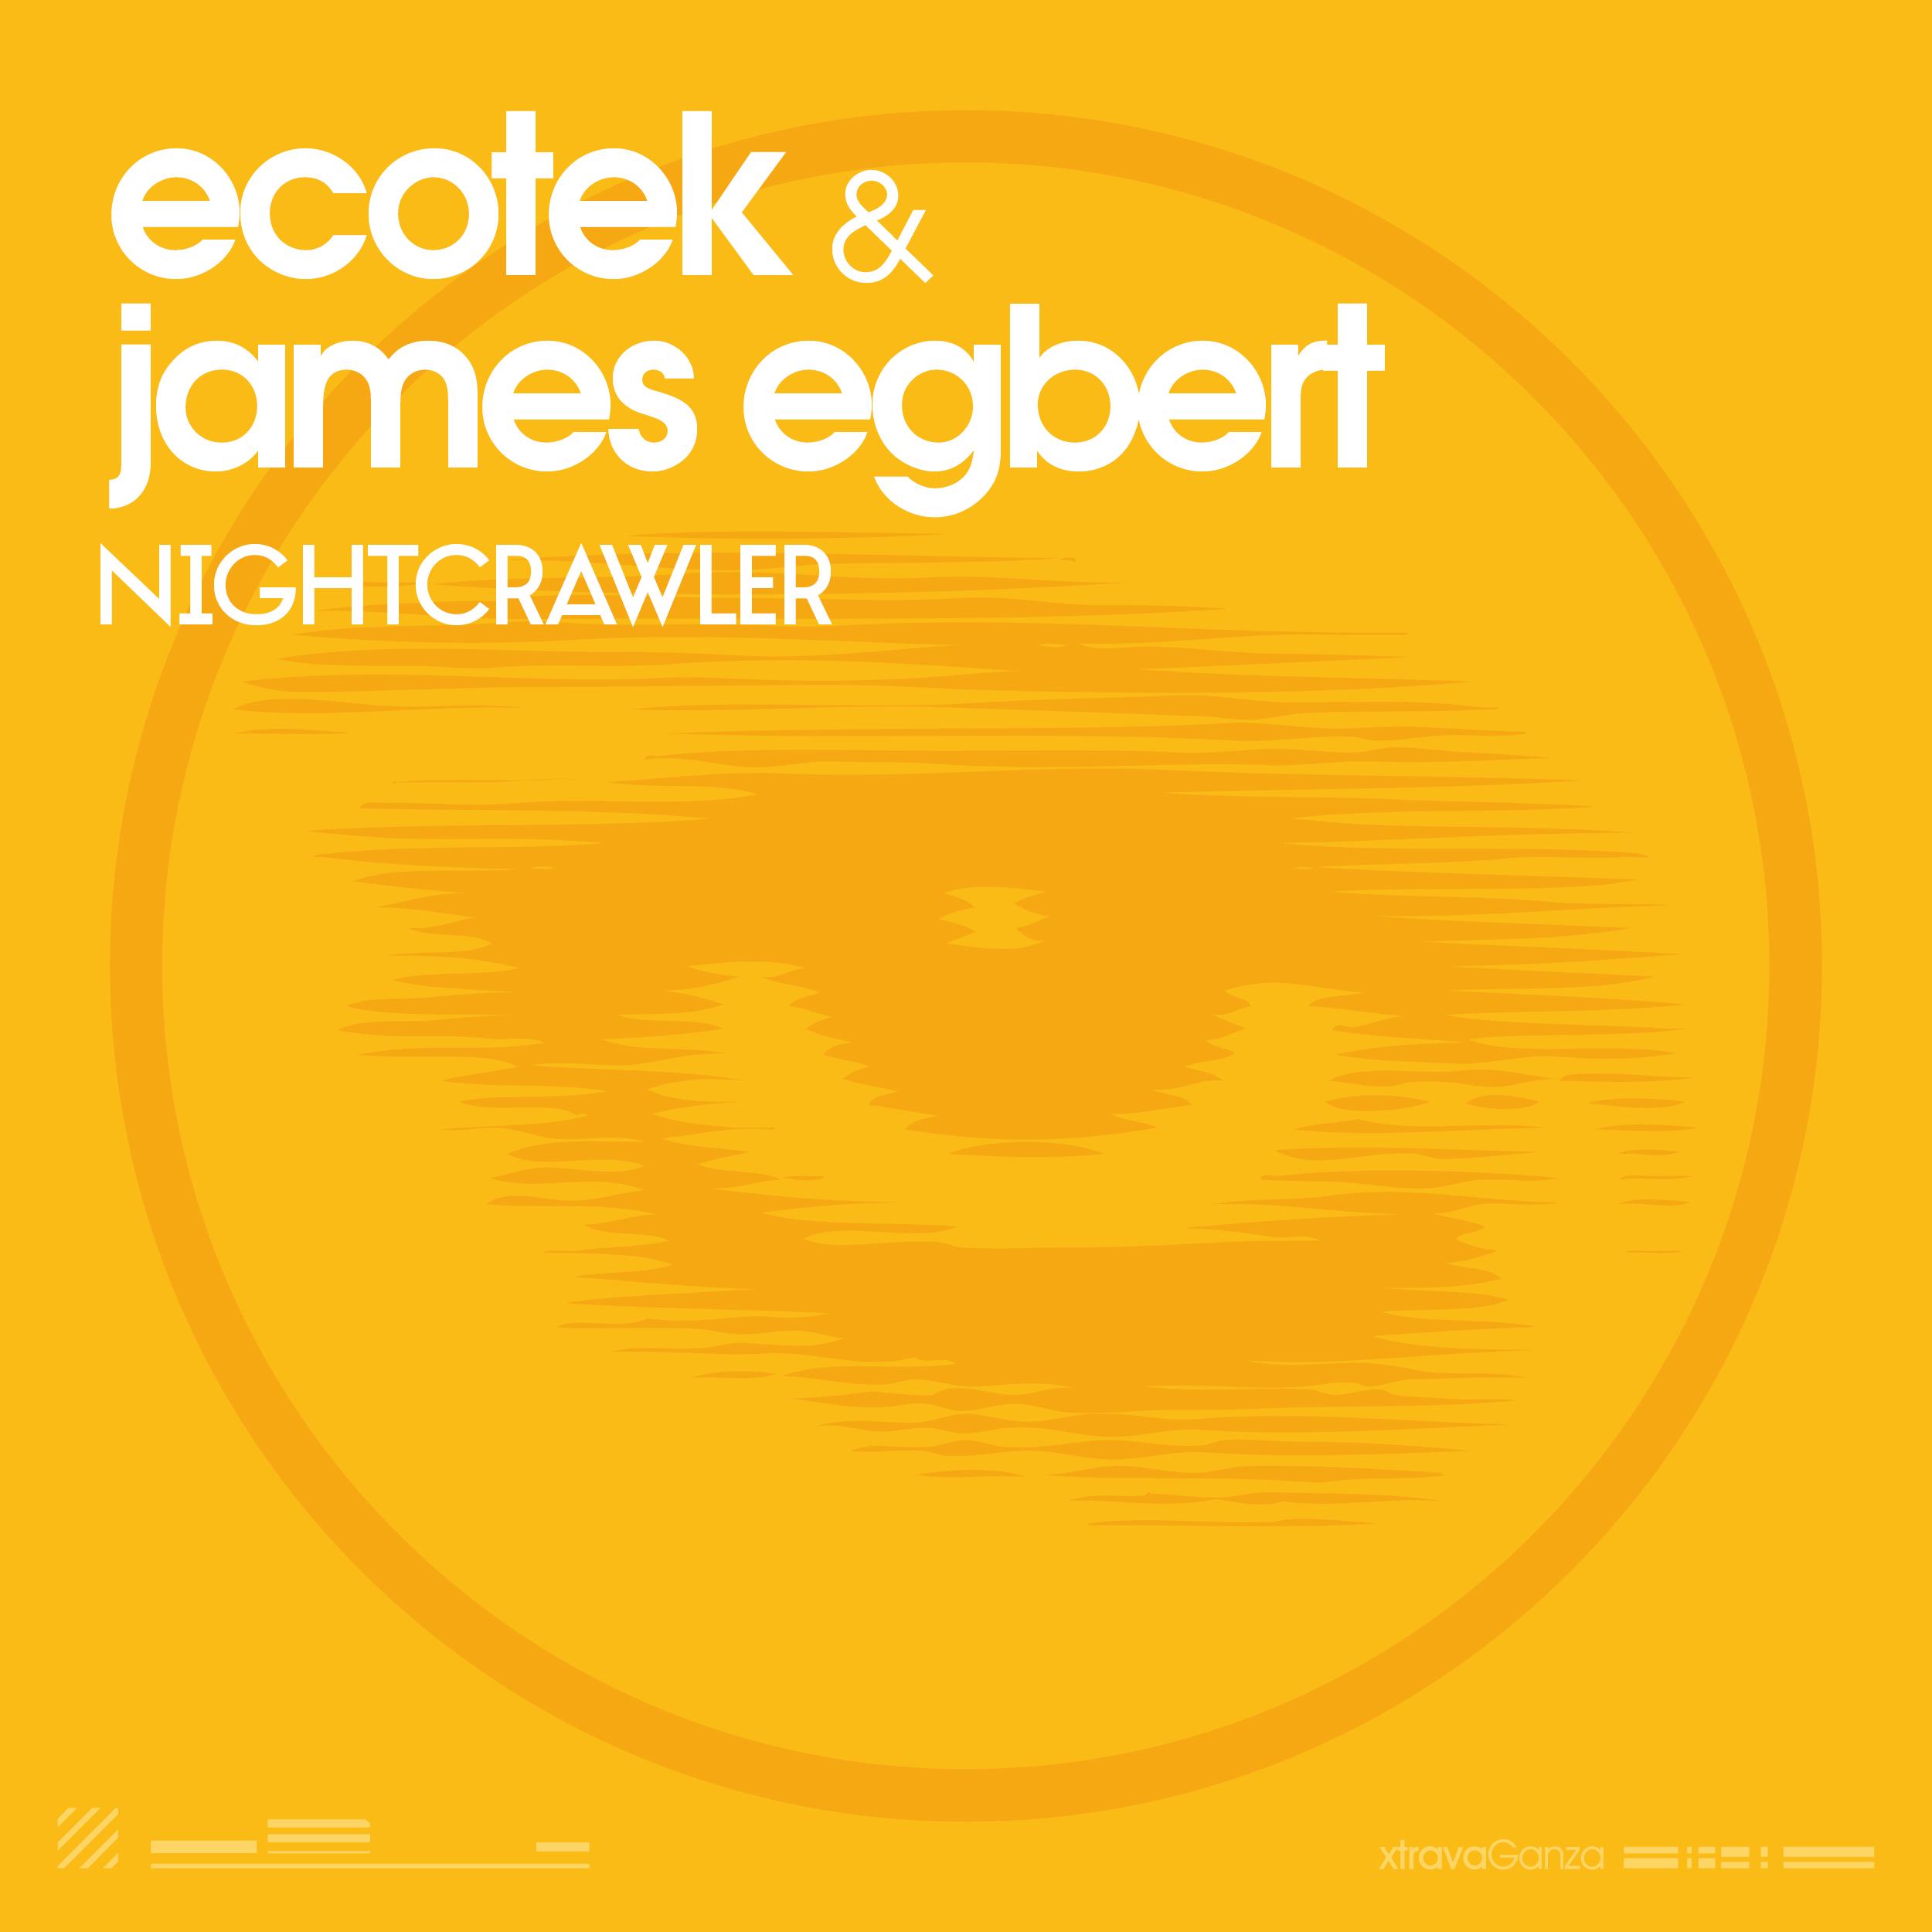 Ecotek & James Egbert – Nightcrawler (Original Mix)